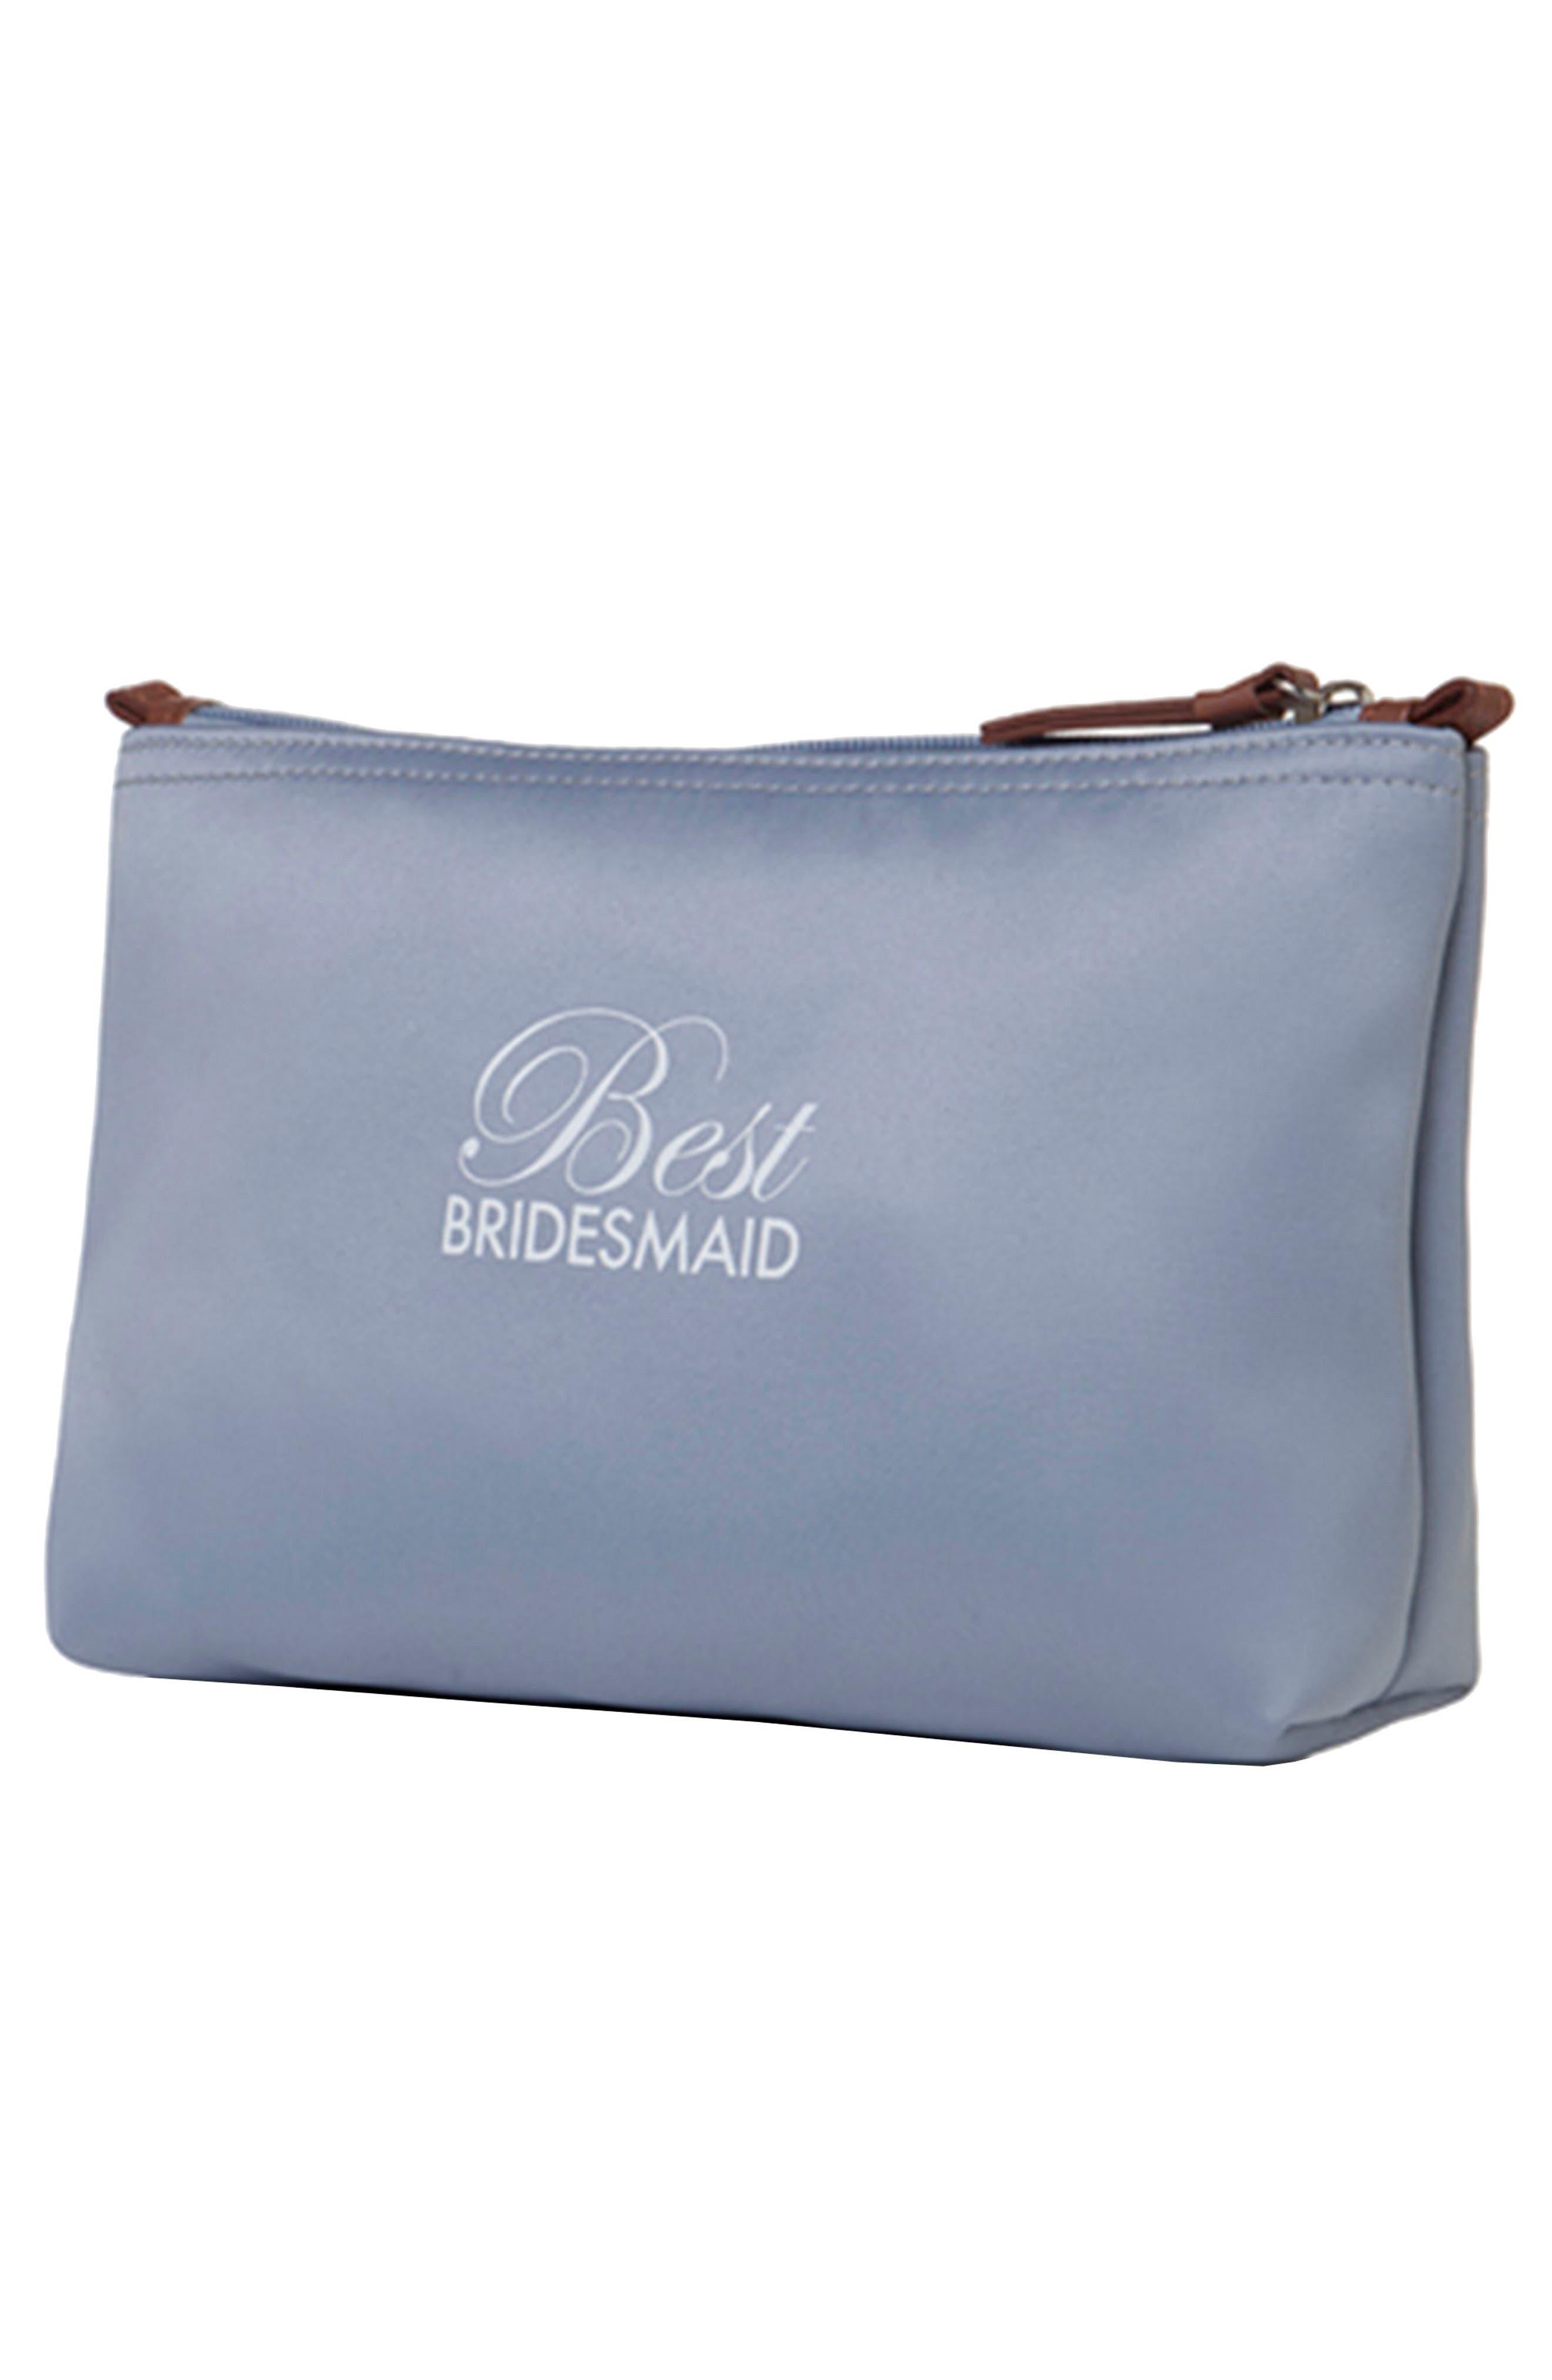 Dessy Collection 'Best Bridesmaid' Cosmetics Bag